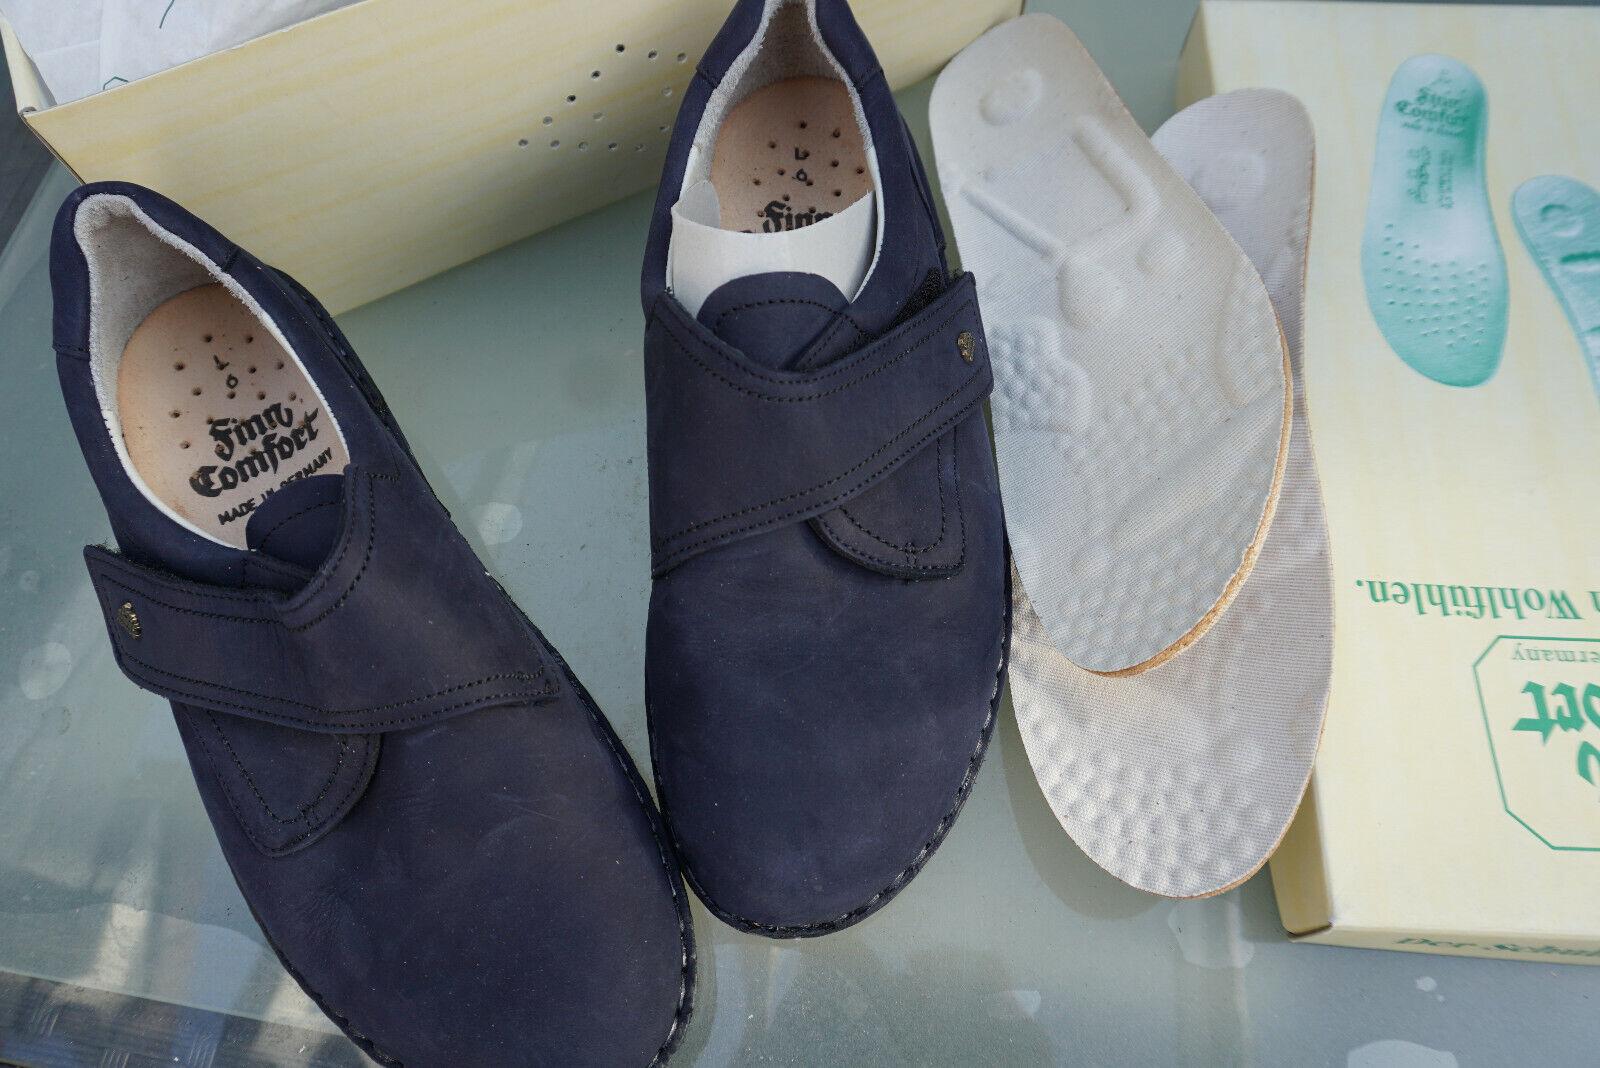 Finn Comfort Villach zapatos señora zapato velcro talla talla talla 5,5 39 nobuck cuero darkazul nuevo  ventas de salida